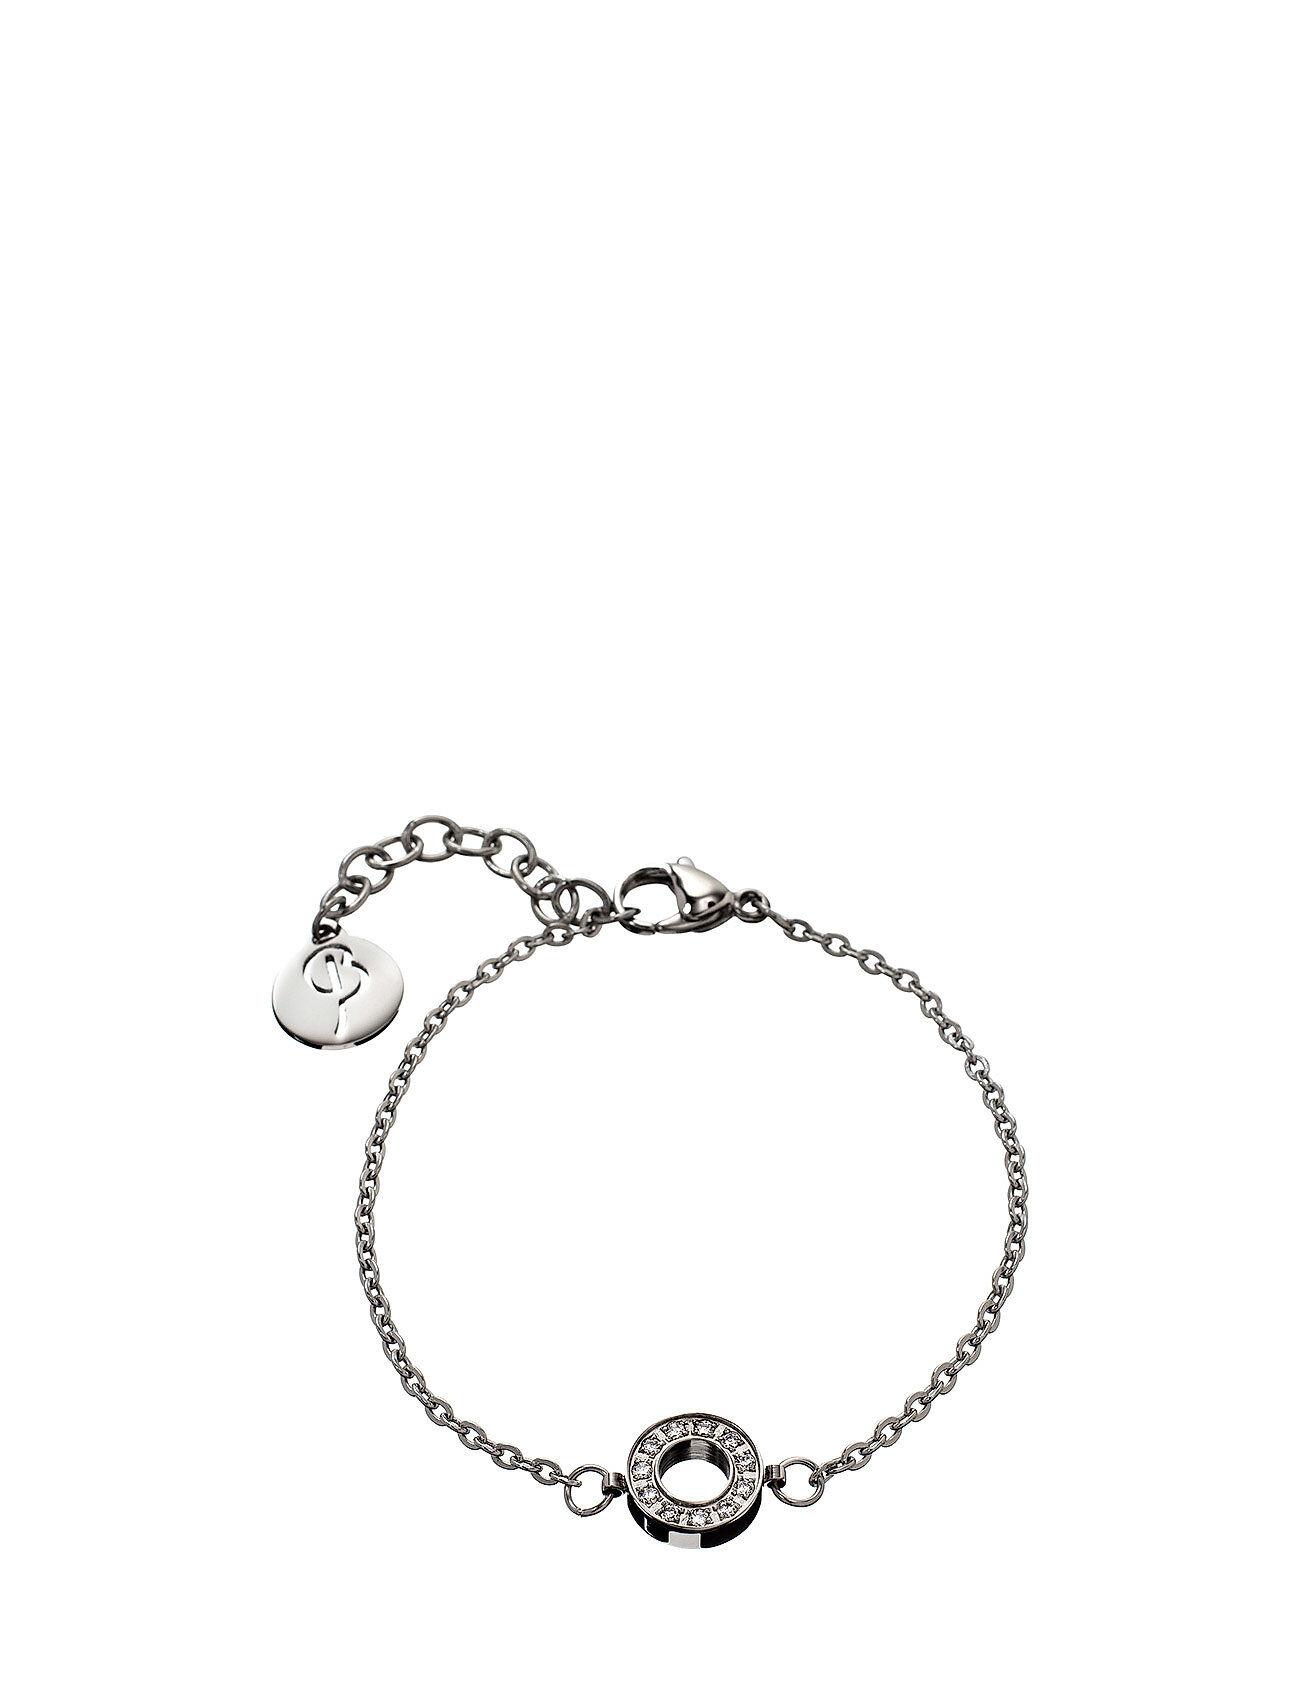 Edblad Eternity Bracelet Mini Accessories Jewellery Bracelets Chain Bracelets Hopea Edblad